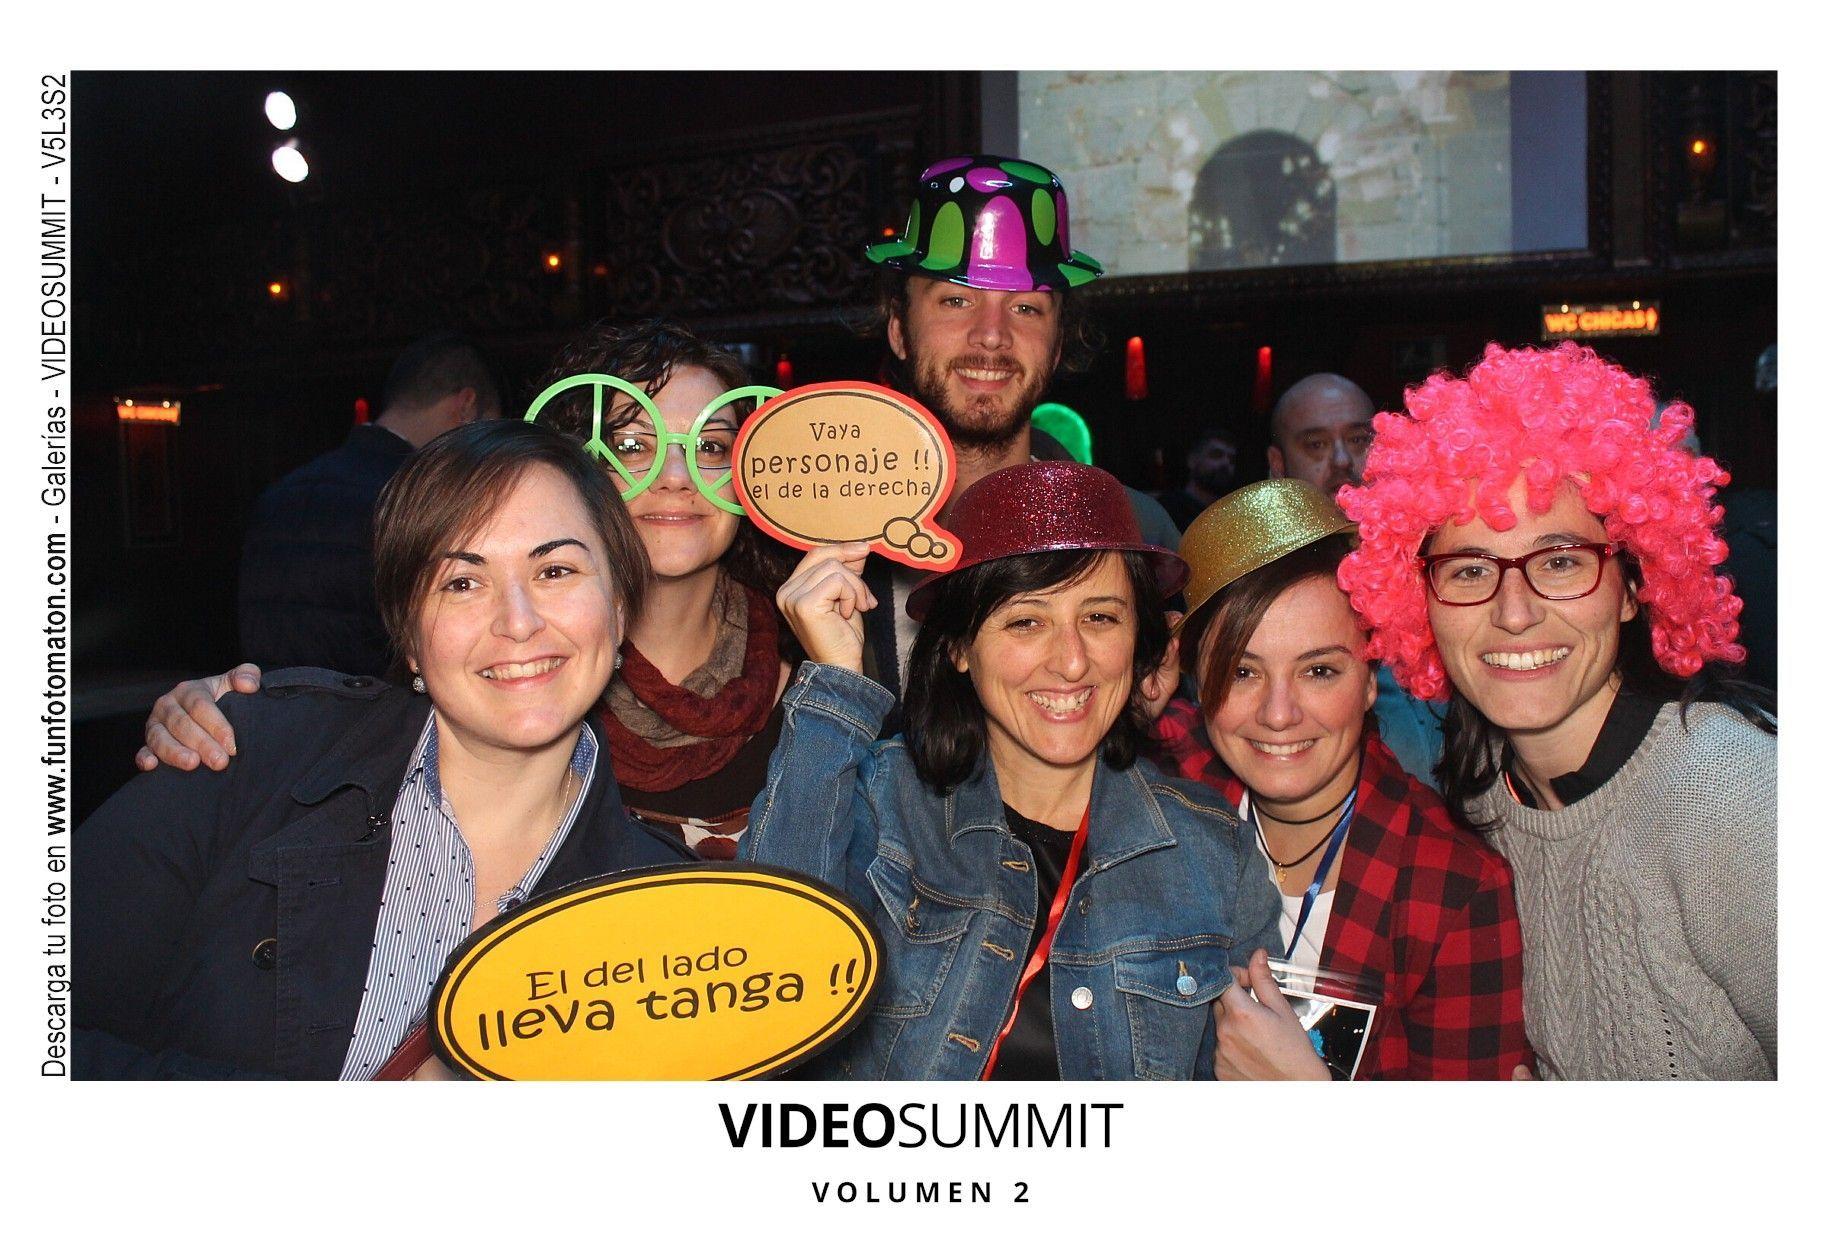 videosummit-vol2-club-party-056